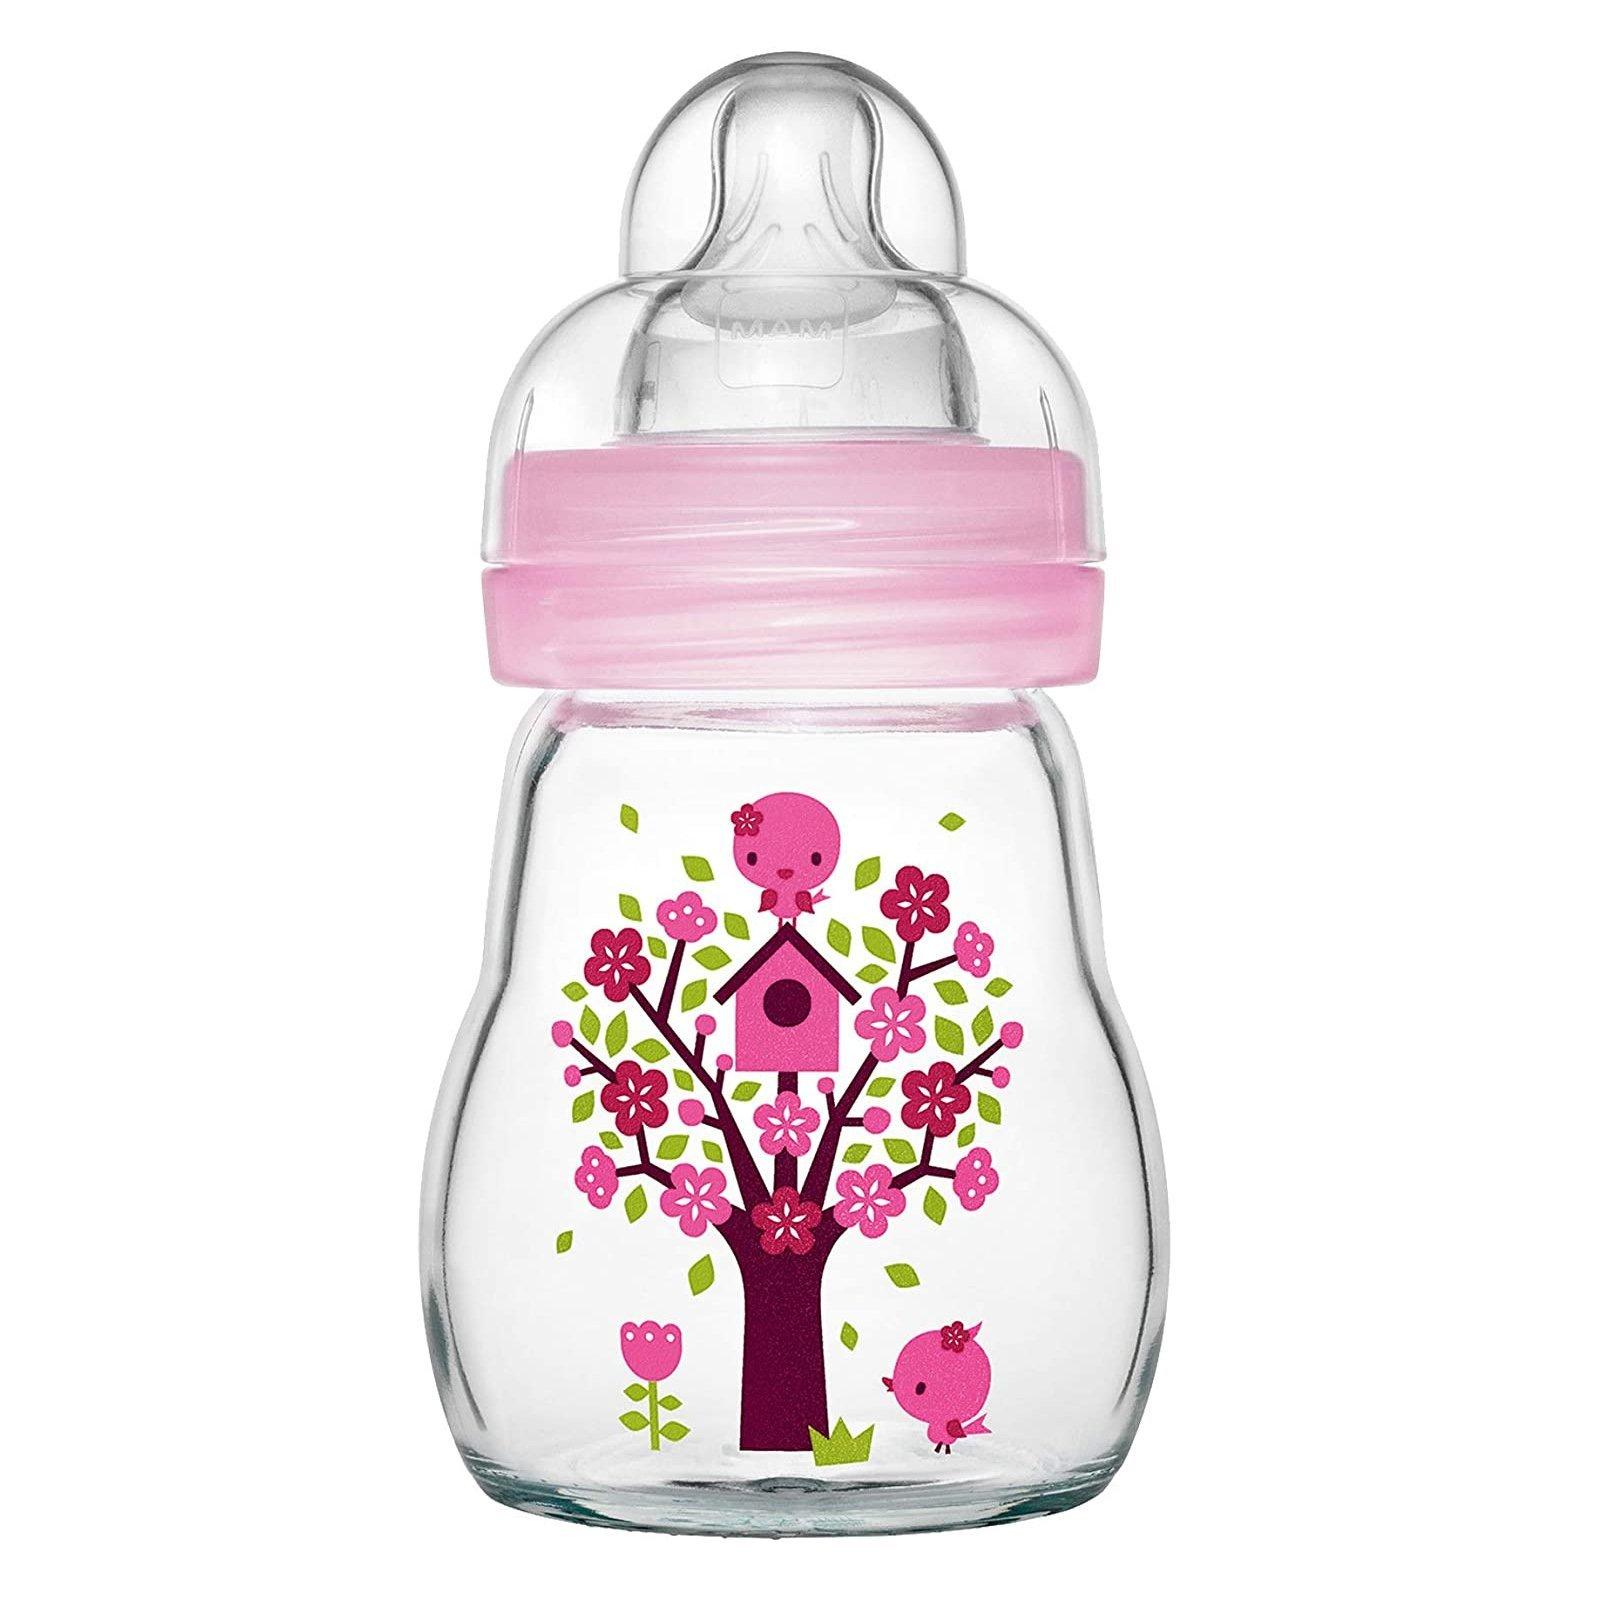 Mam Feel Good Κωδ 370S1 Γυάλινο Μπιμπερό με Θηλή Σιλικόνης από 0+ Μηνών & Δώρο μια Επιπλέον Θηλή Σιλικόνης 2+ Μηνών, 170ml – ροζ